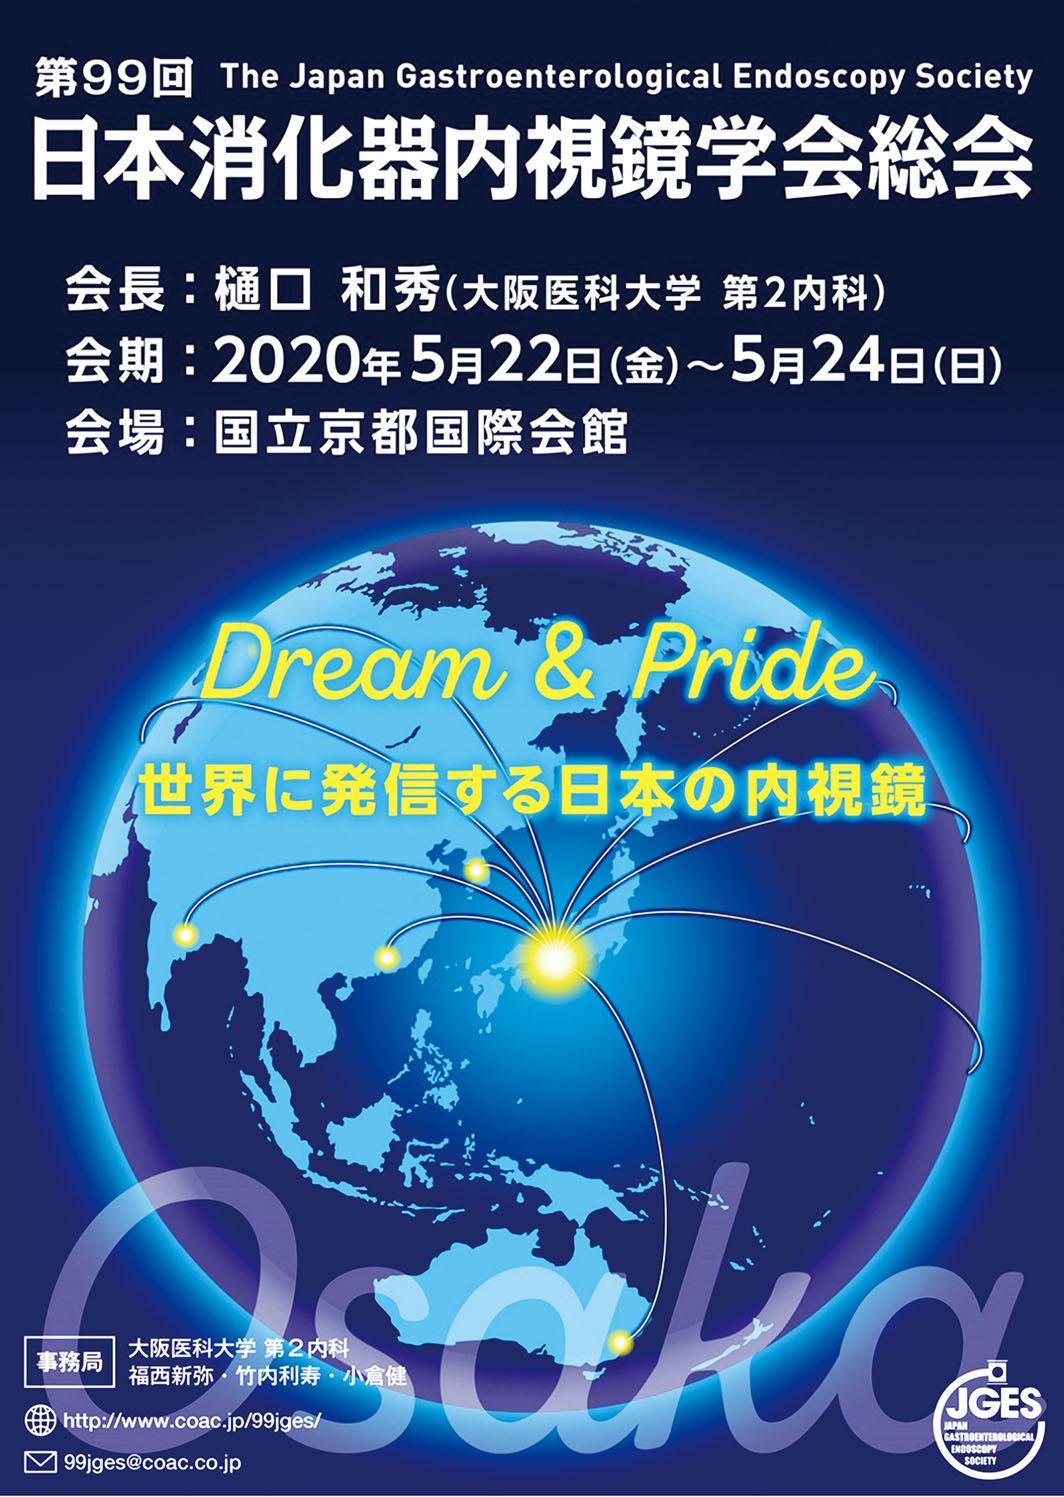 第99回日本消化器内視鏡学会総会 Dream&Pride   世界に発信する日本の内視鏡